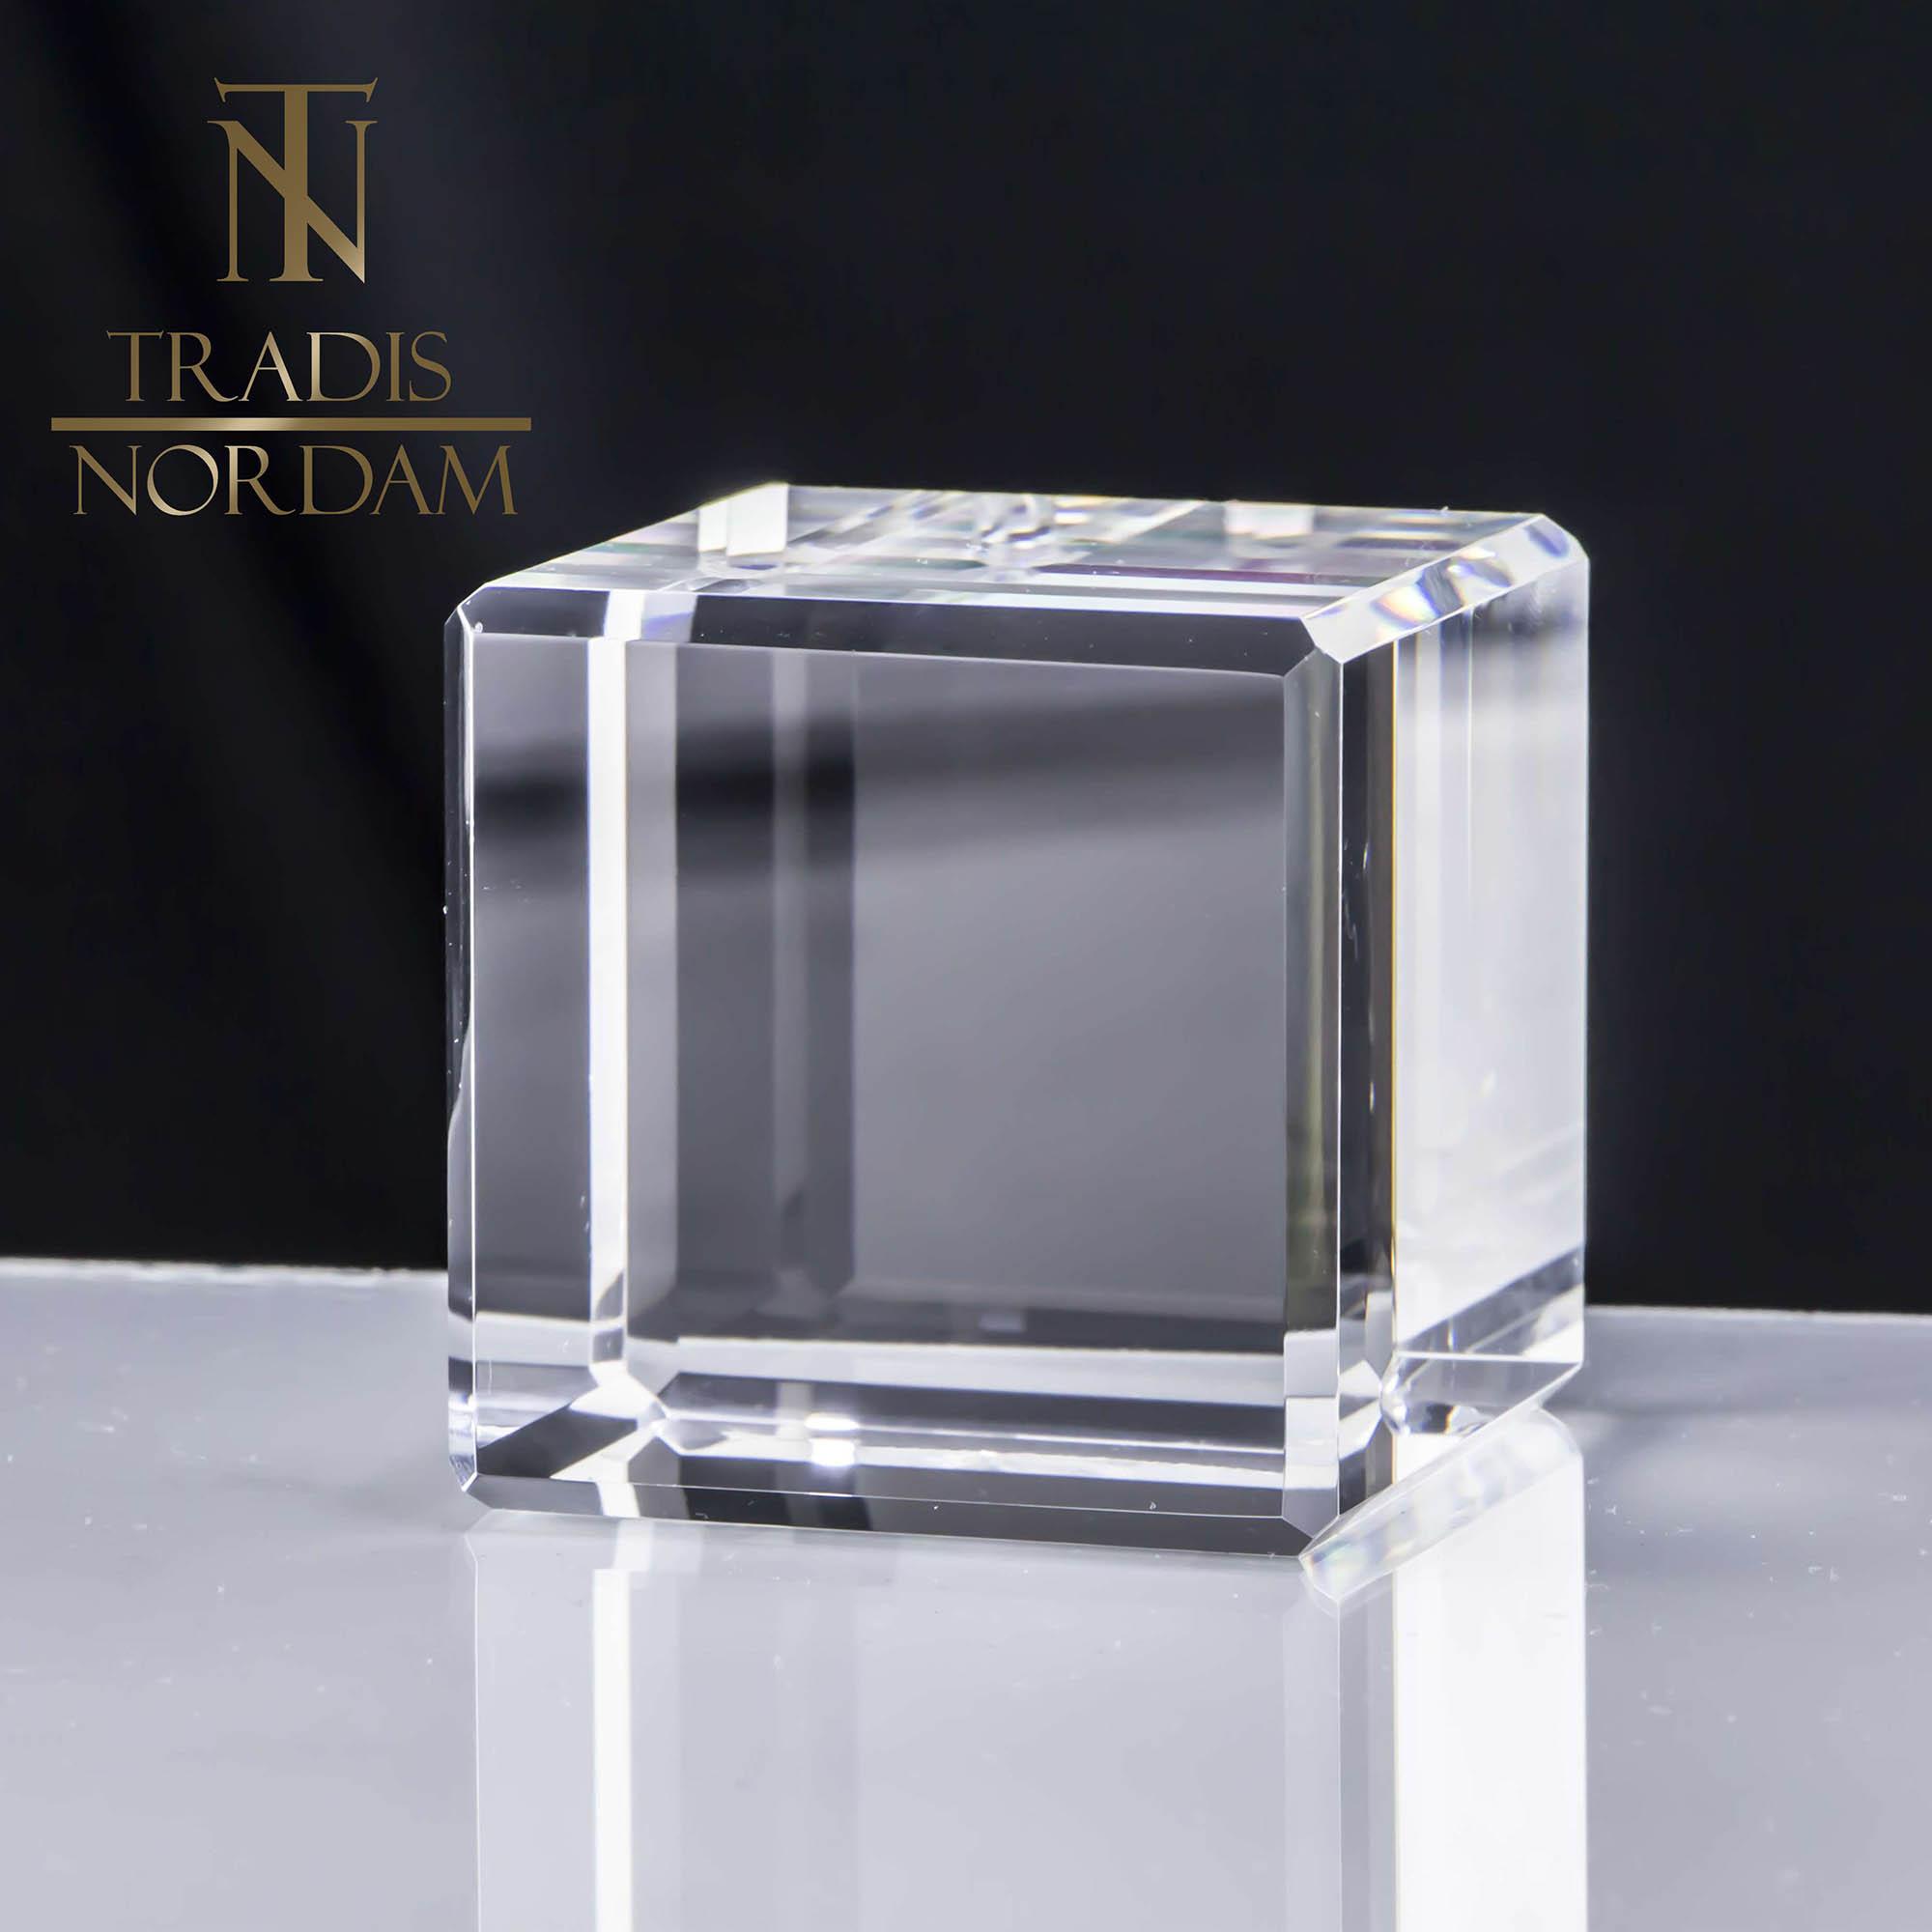 cubo 5x5 biselado